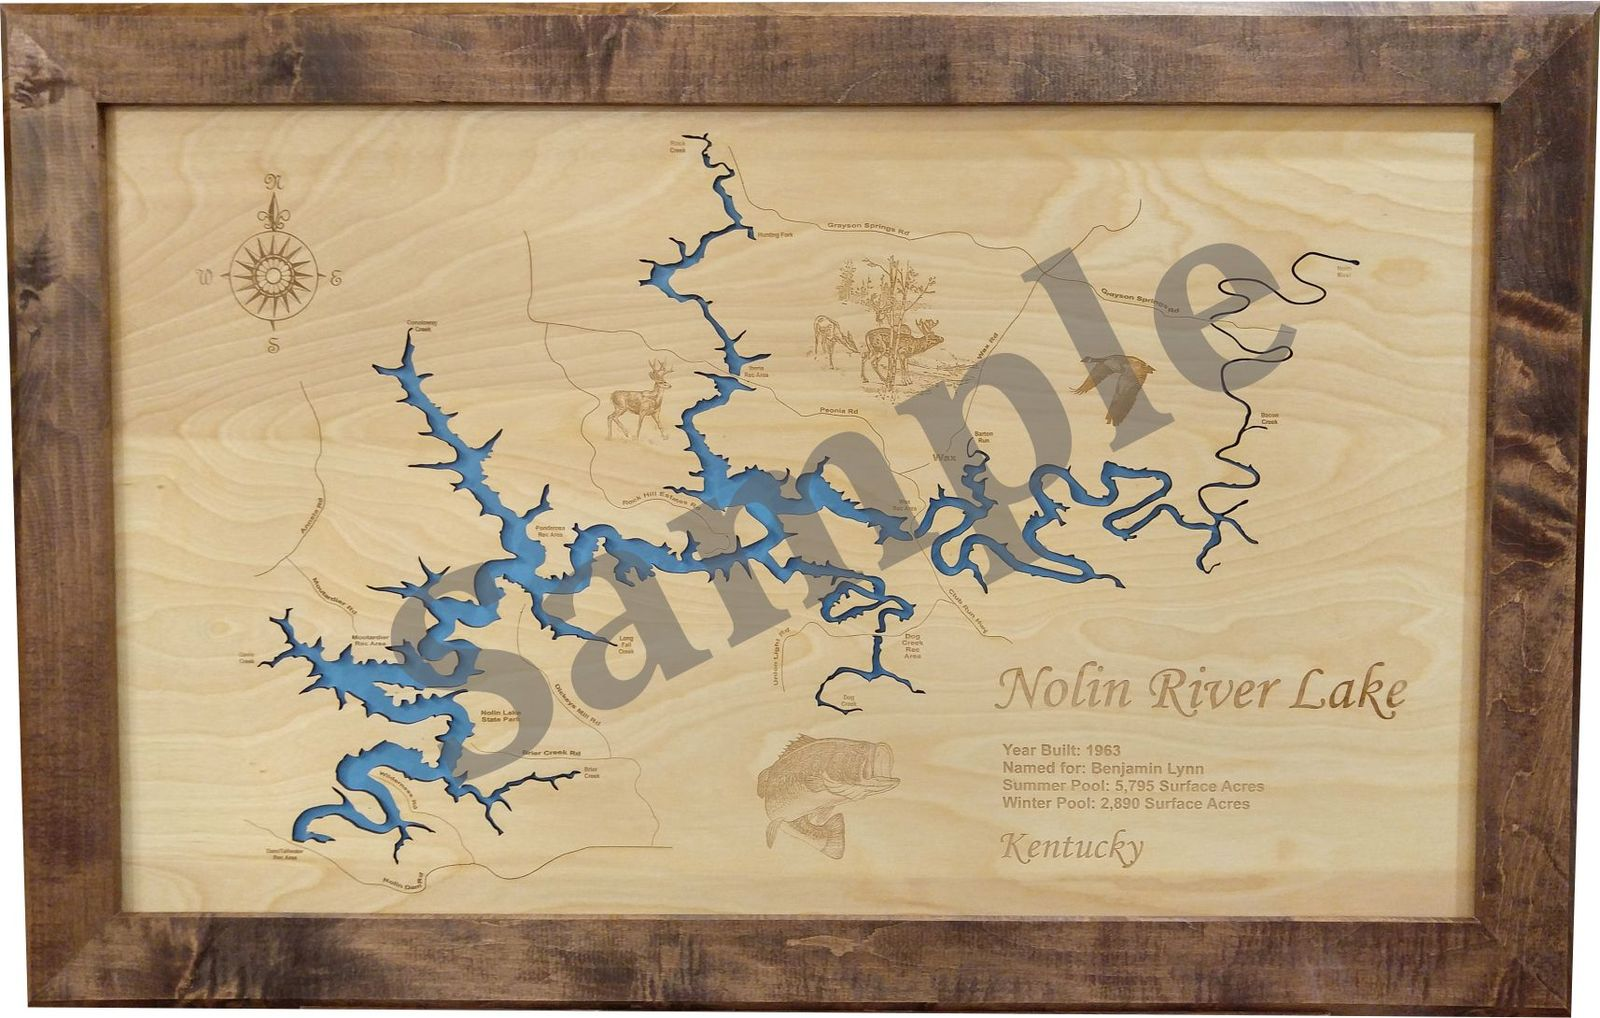 Wood Laser Cut Map of Aquia Creek, VA and 38 similar items on